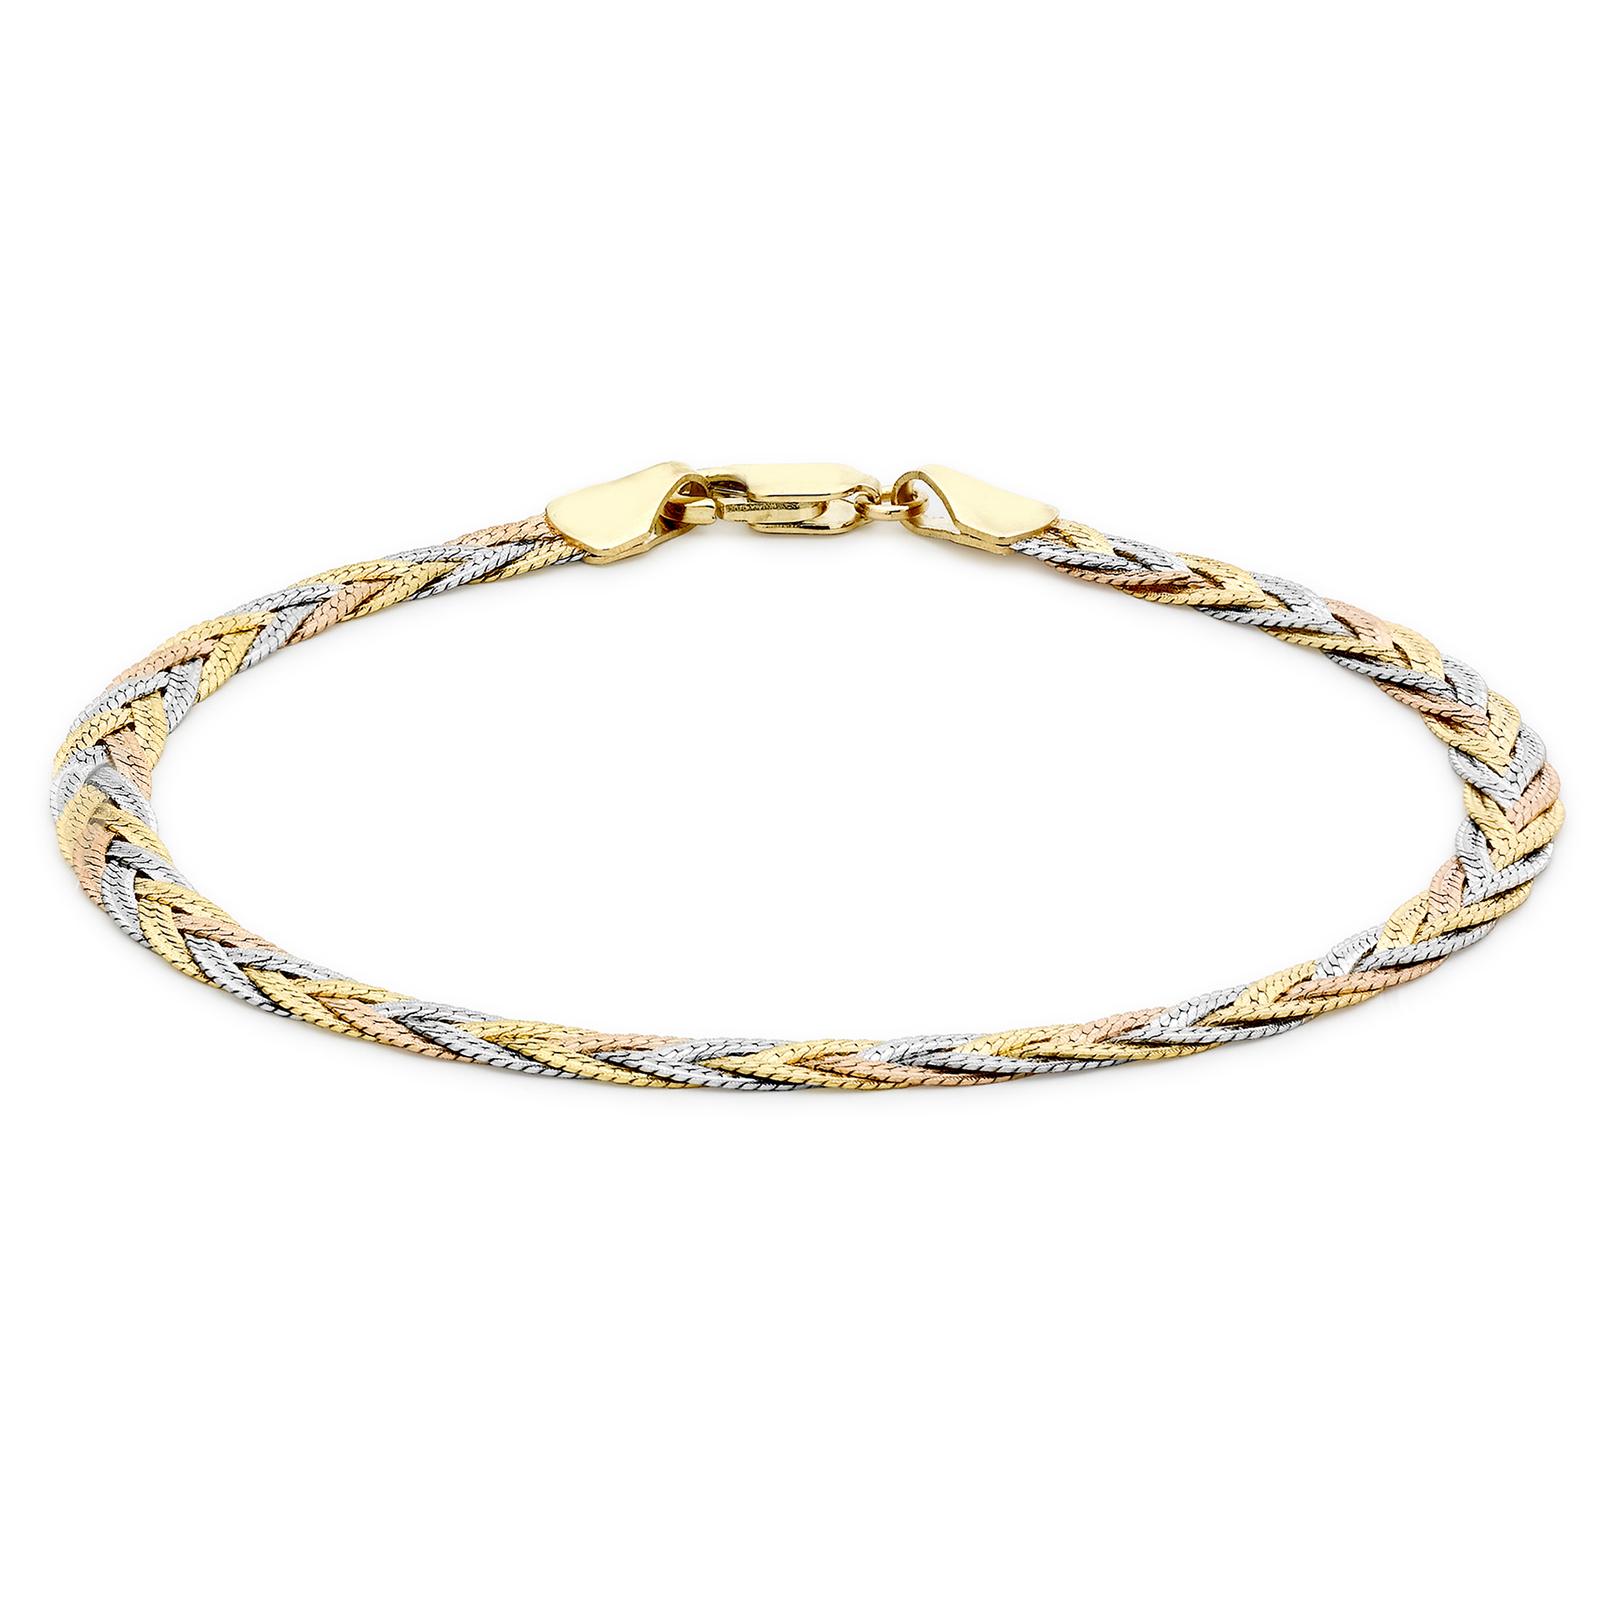 59ca86ca8b1d12 9ct Tricolour Gold Plait Herringbone Bracelet | Bracelets | Jewellery |  Goldsmiths